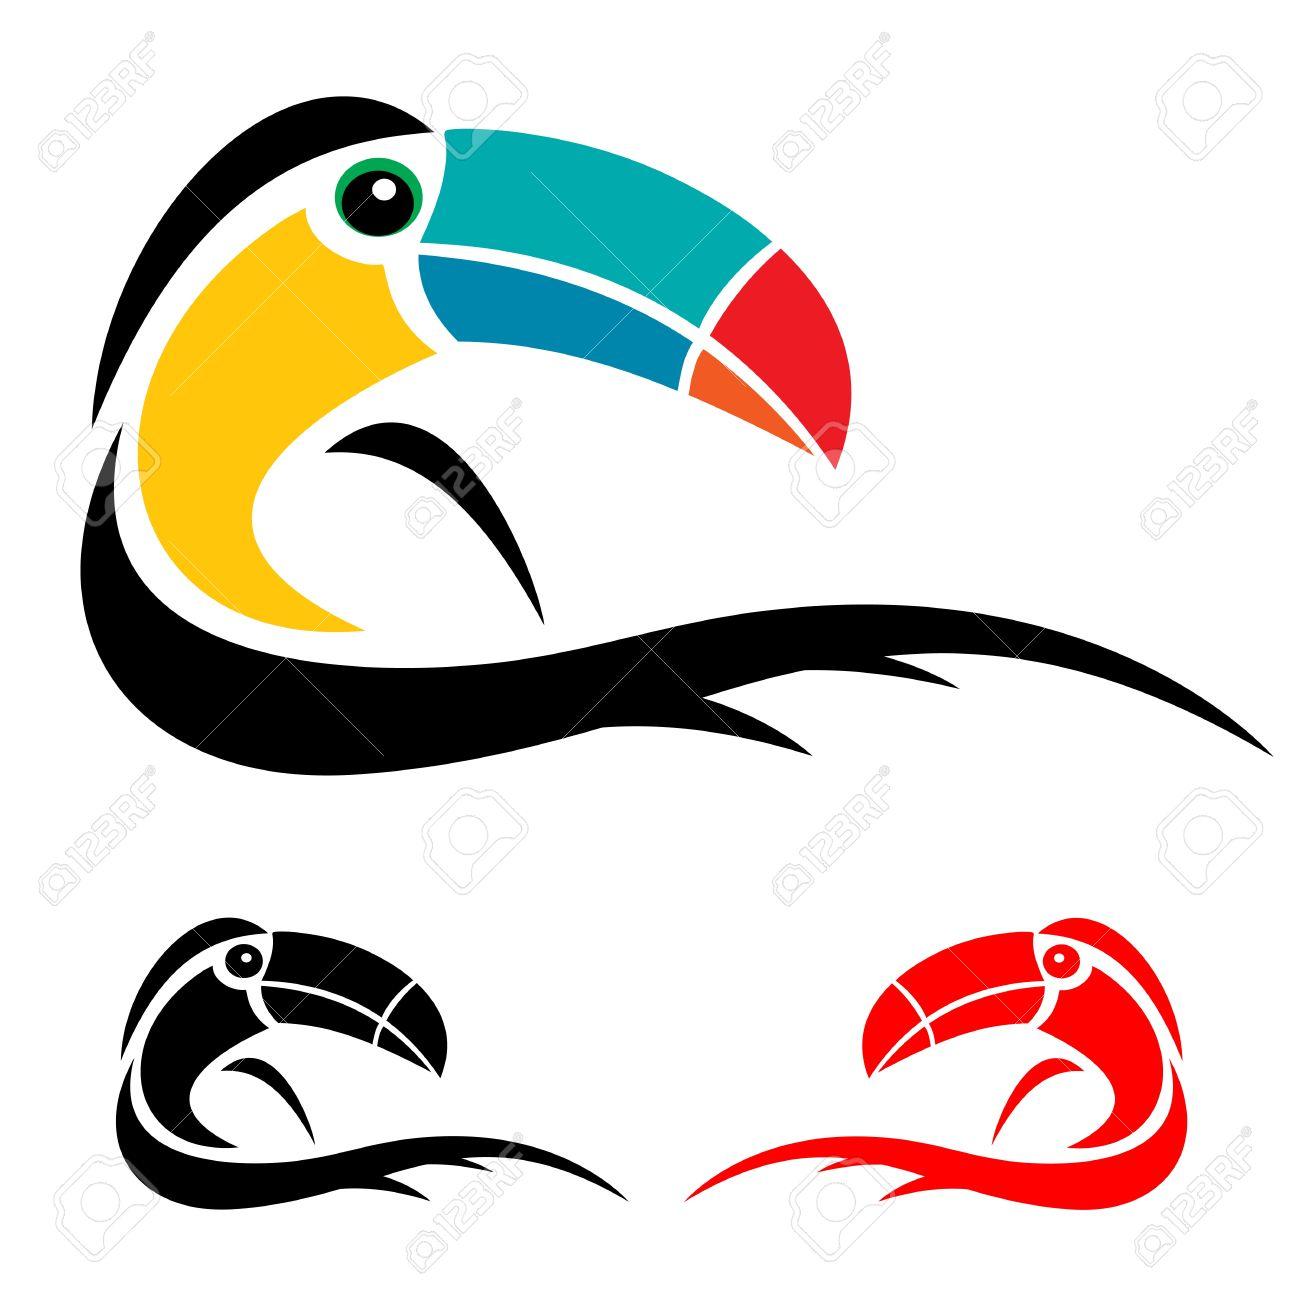 Hornbill Bird Images Hornbill Bird Hornbill